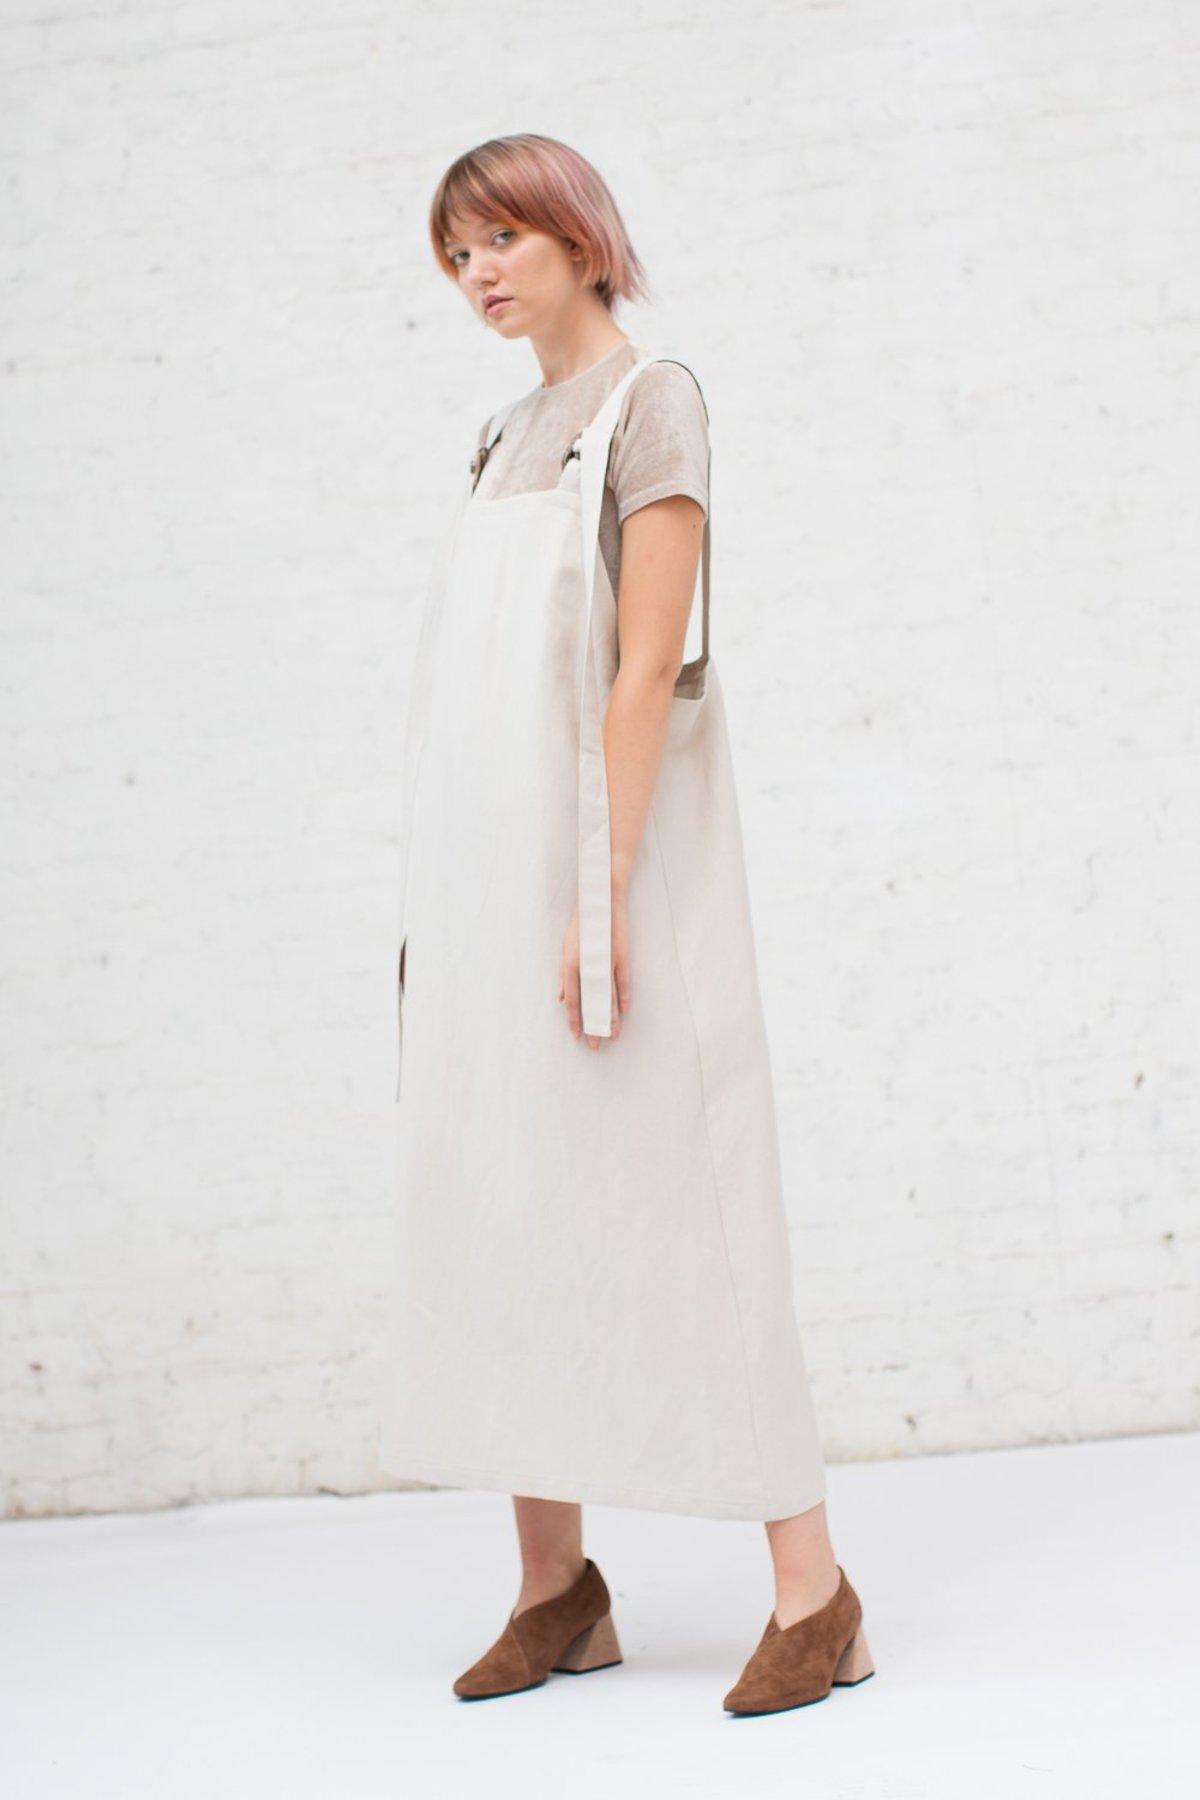 6679b21d7a Baserange Duffy Overall Dress in Beige